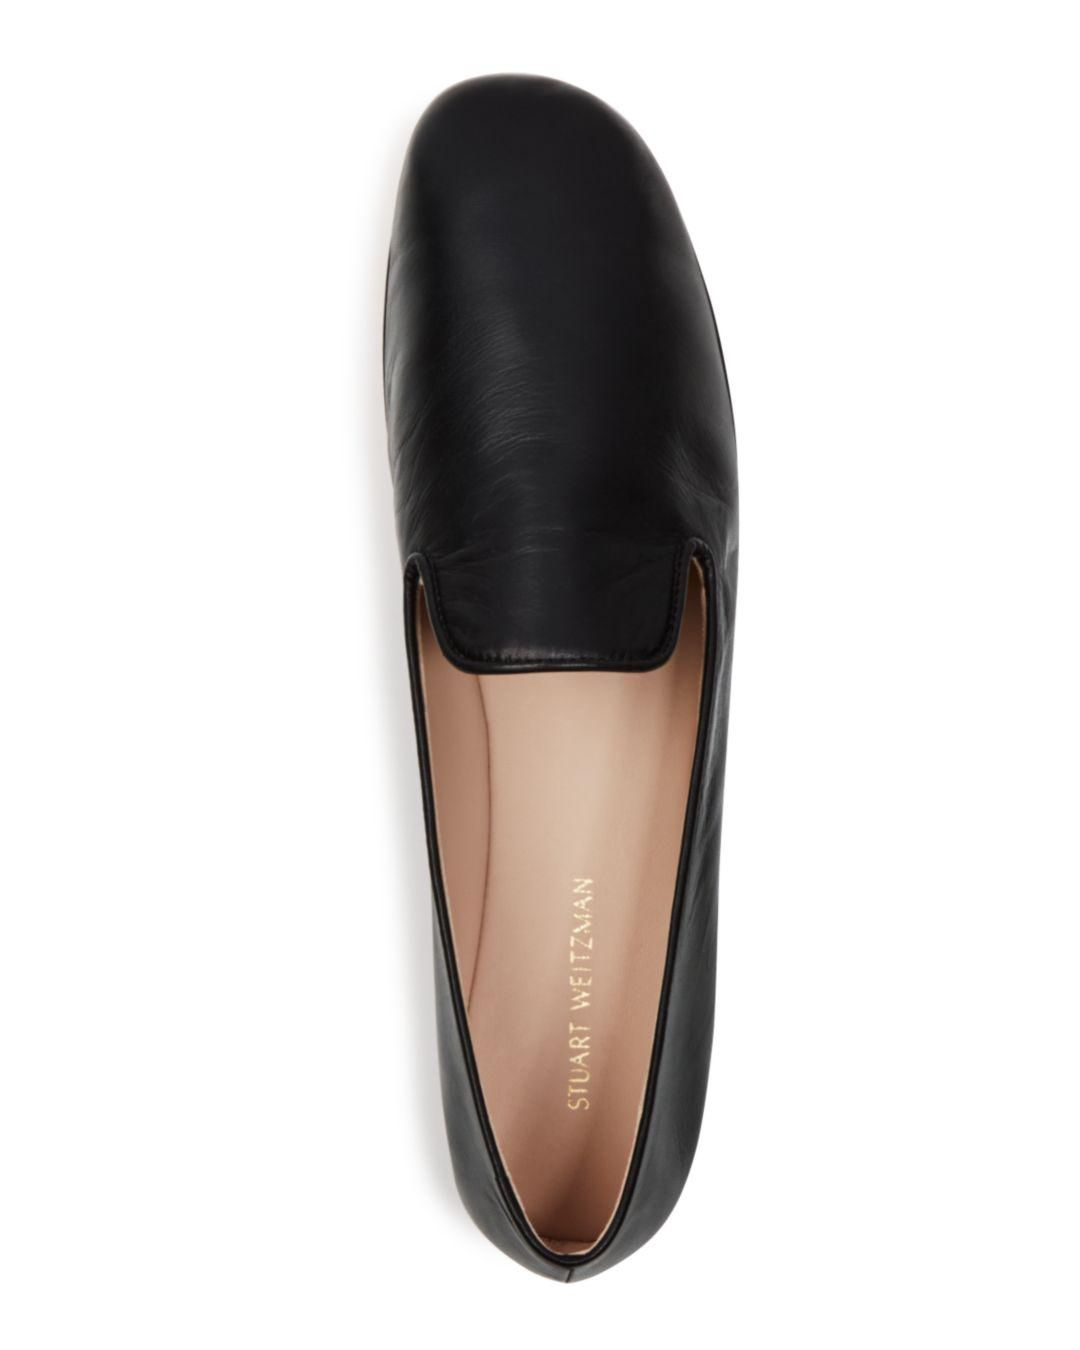 4309186f0e1 Stuart Weitzman Women s Myguy Leather Smoking Slippers in Black - Lyst